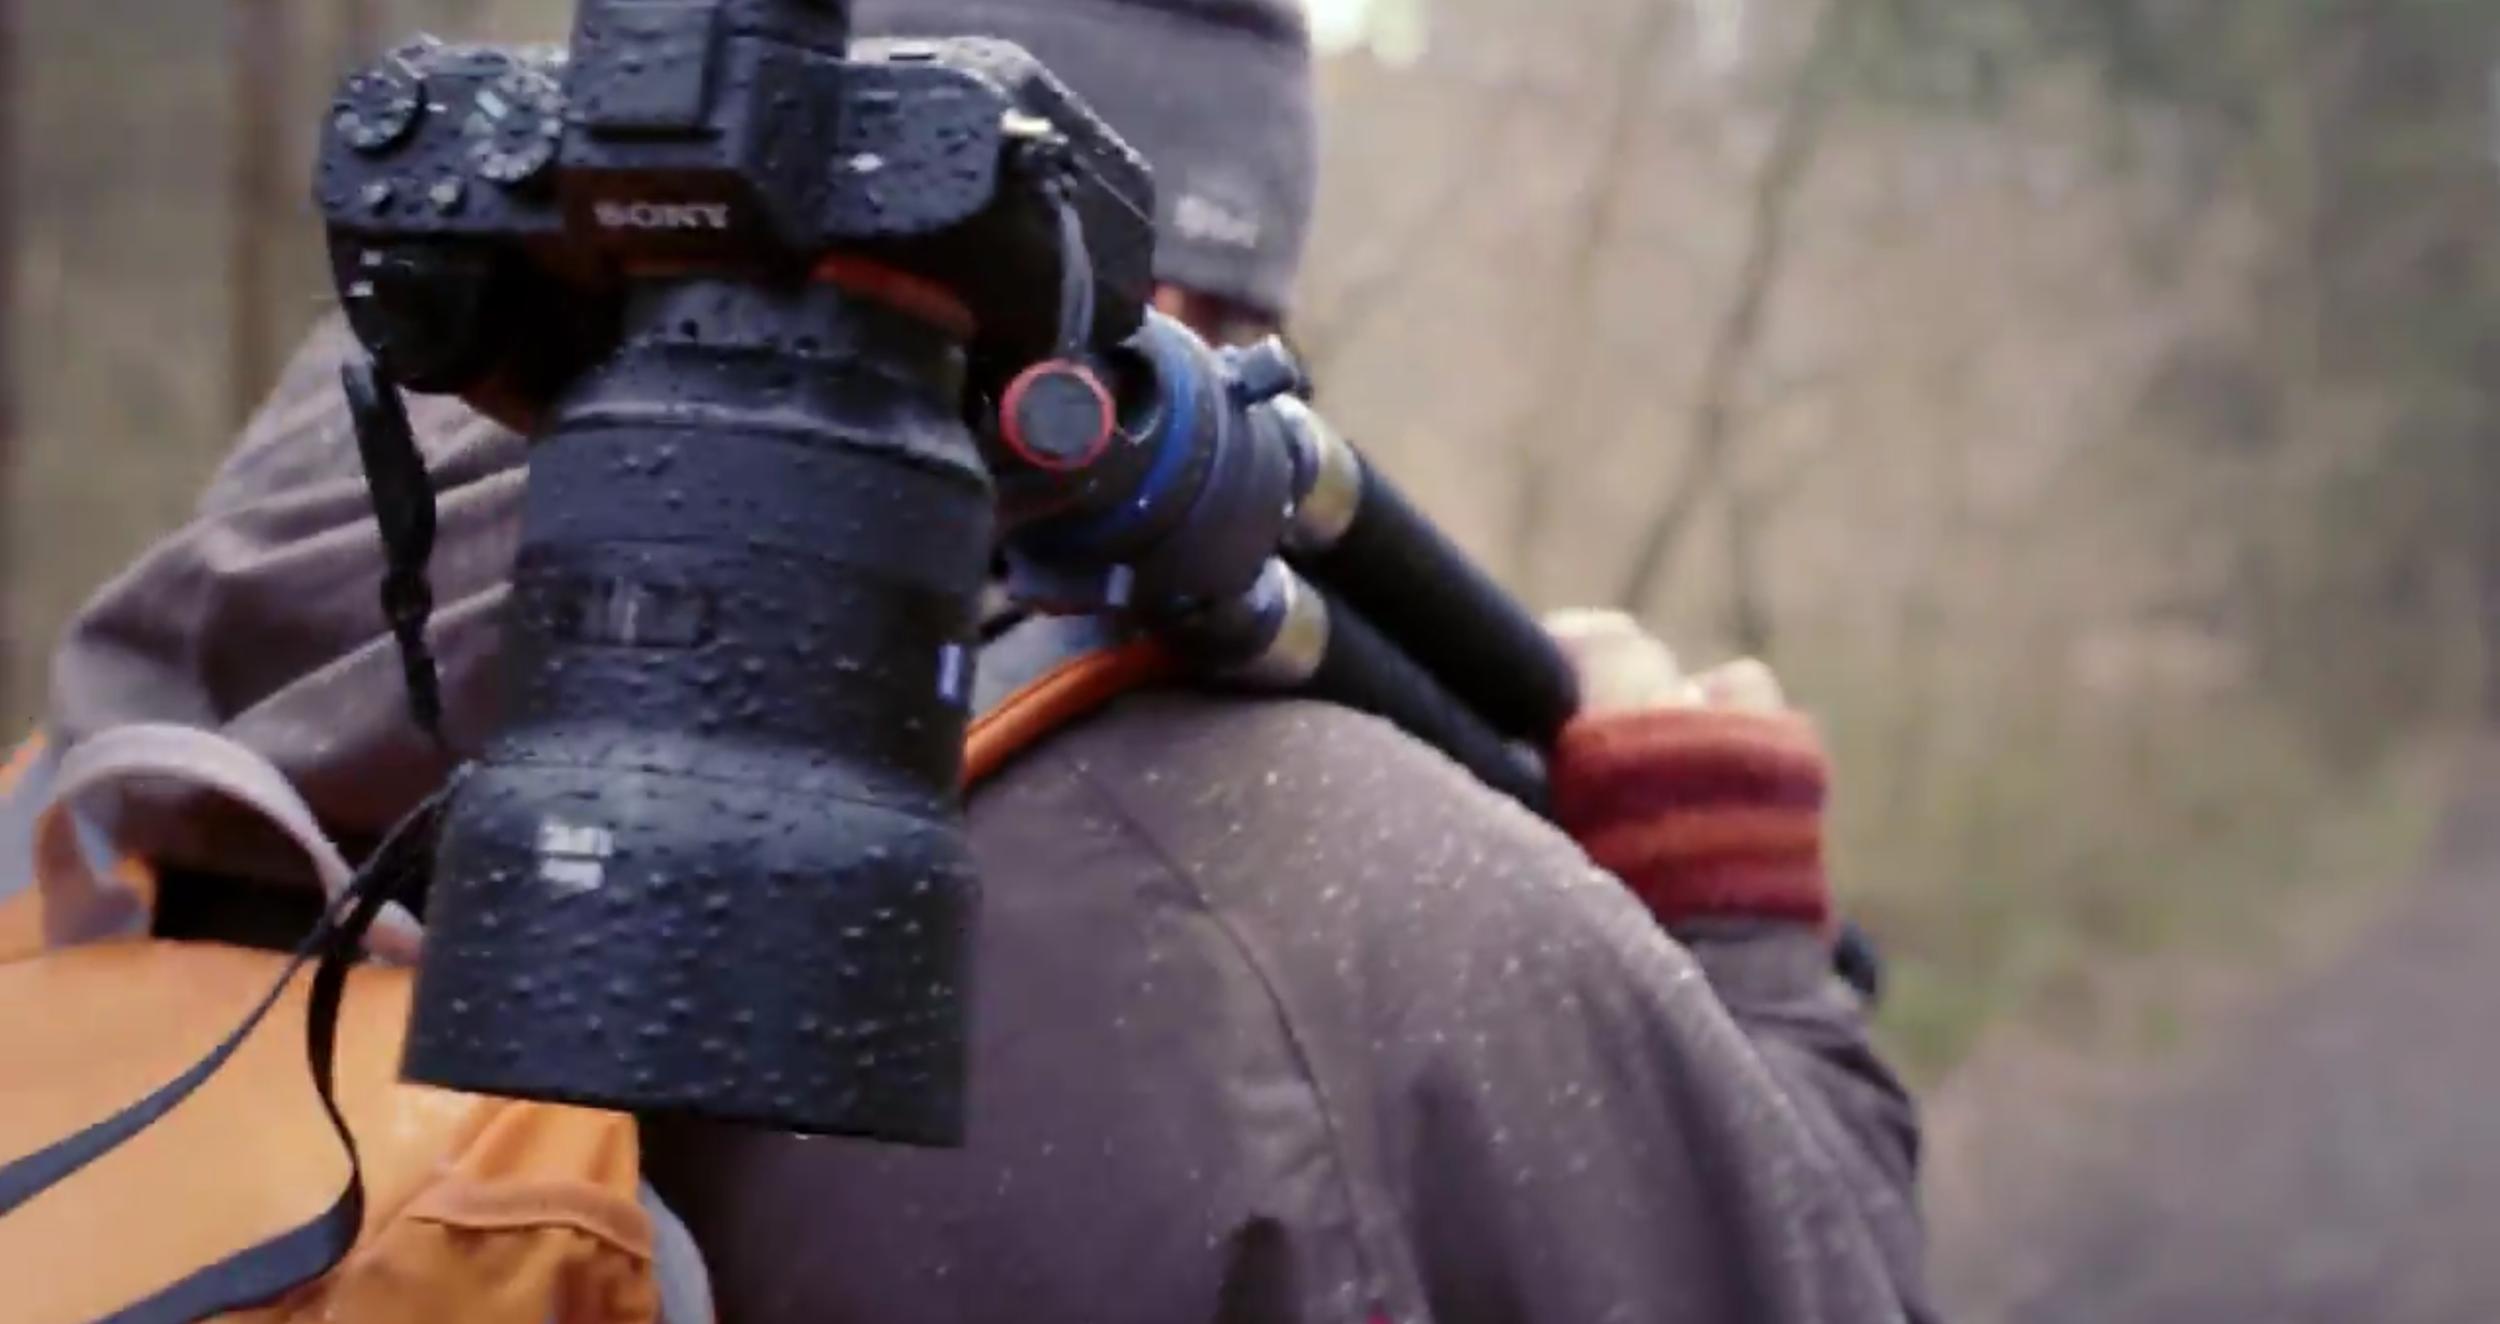 Zeiss Batis Sony Full Frame E Mount 85mm 25mm Weather Sealed